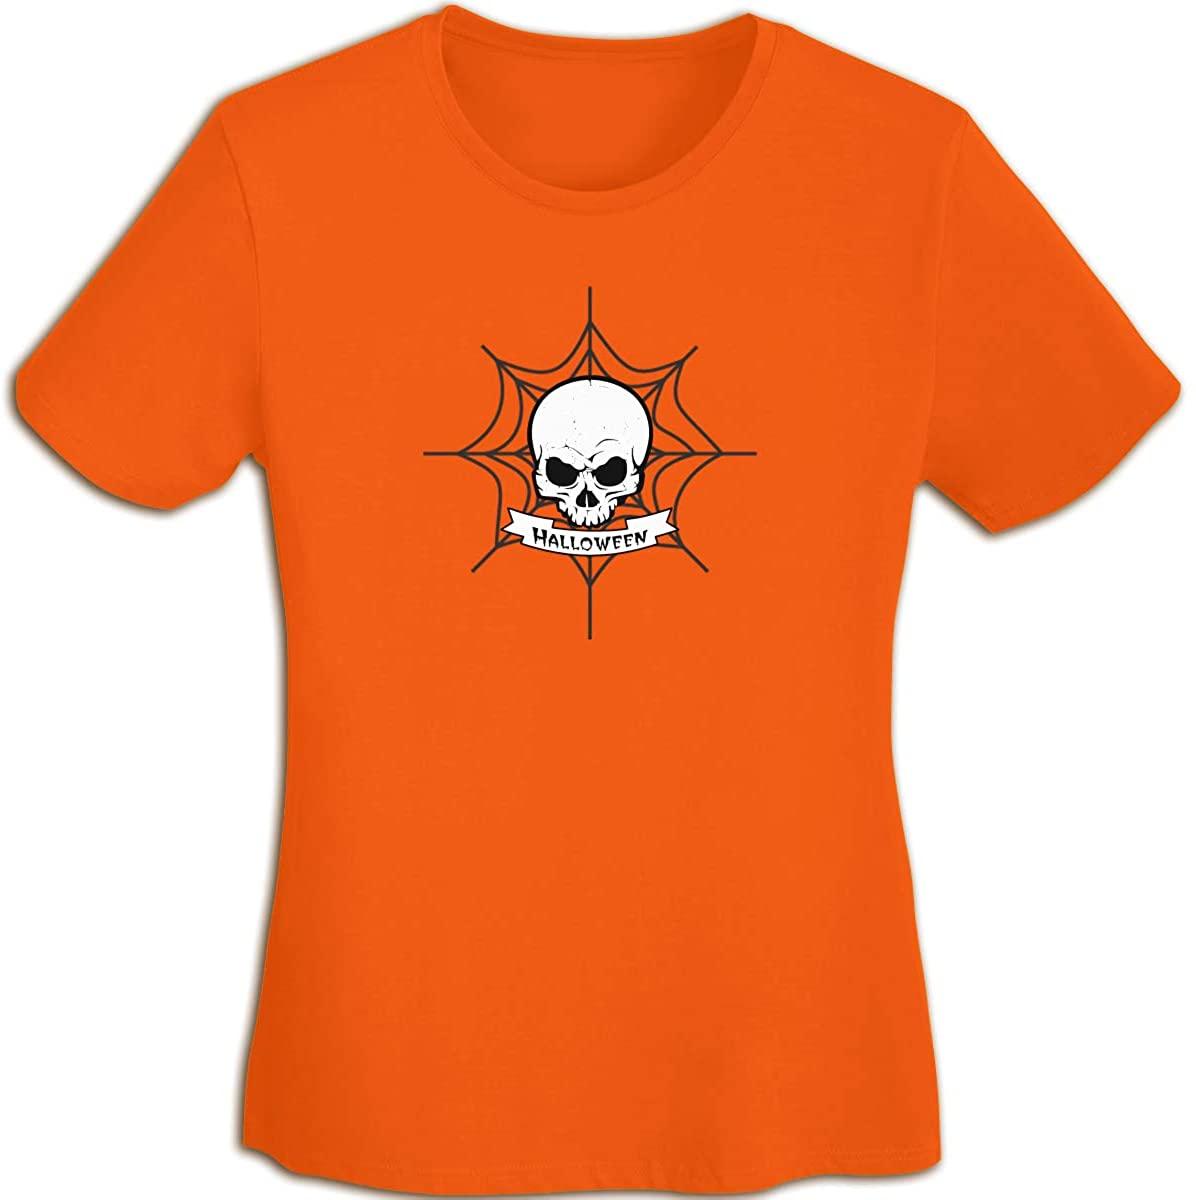 JX-EASY Women's Short Sleeve T-Shirt Crew-Neck Casual Tees Baseball Sports Halloween Big Skull Head Printing Quick-Dry Shorts